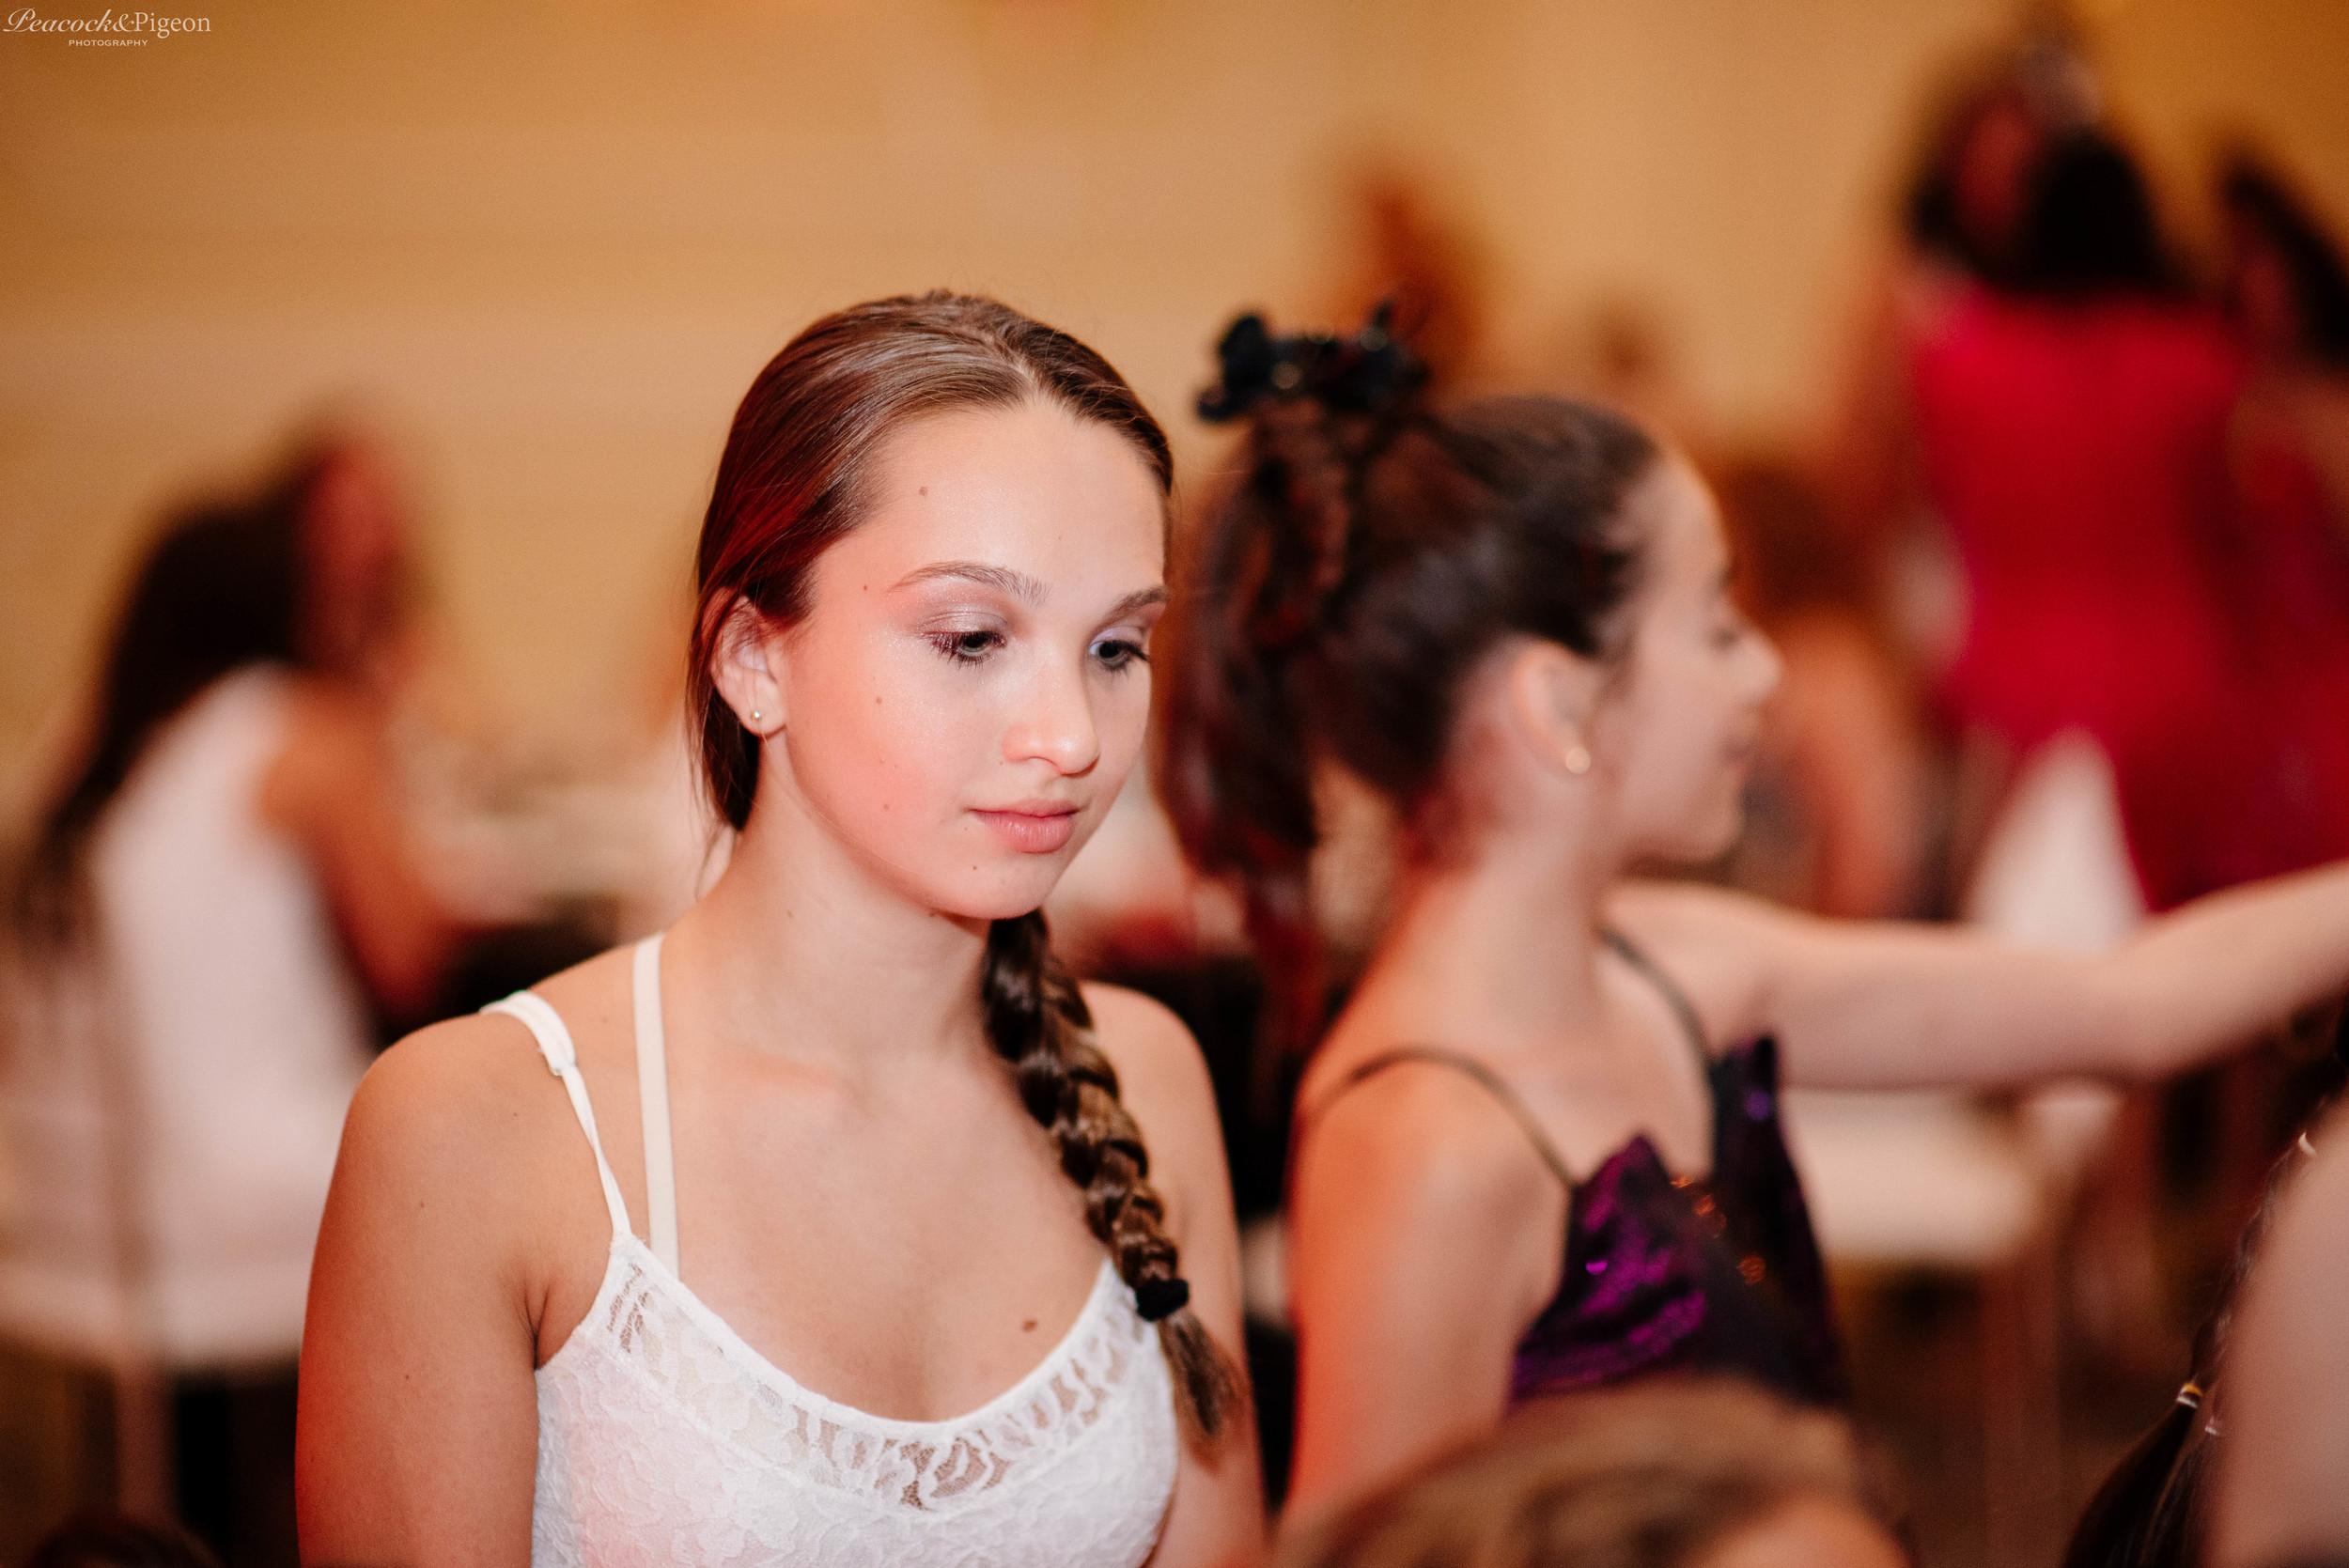 Next_Level_All_Star_Dance_School_Part2B-W-61-172.jpg